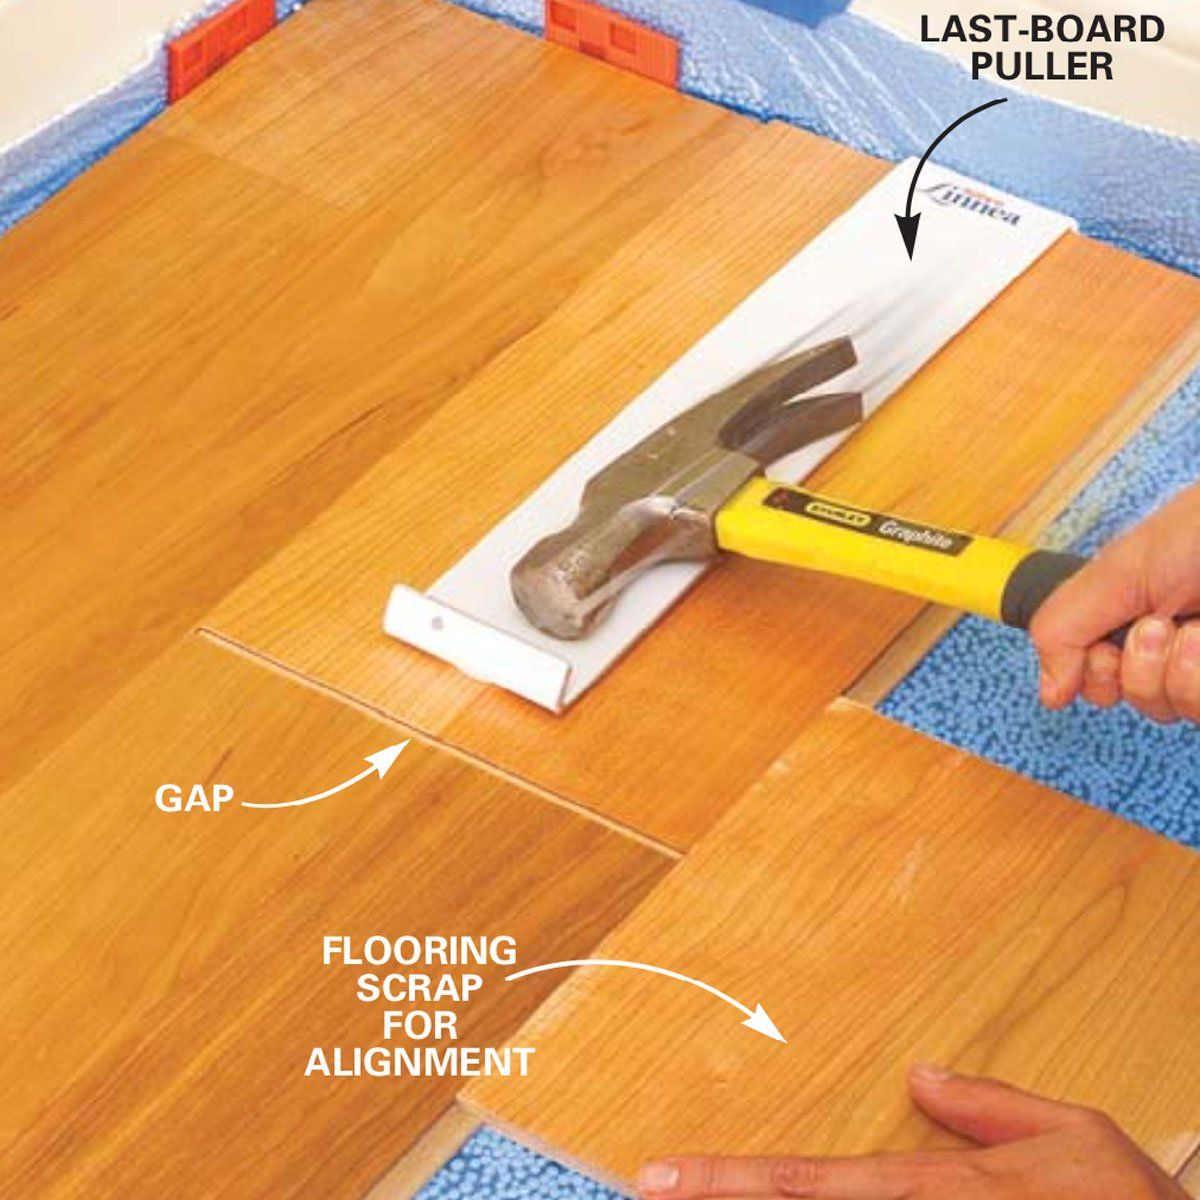 Guide To Installing Laminate Flooring In 2020 Installing Laminate Flooring Laminate Flooring Installing Hardwood Floors